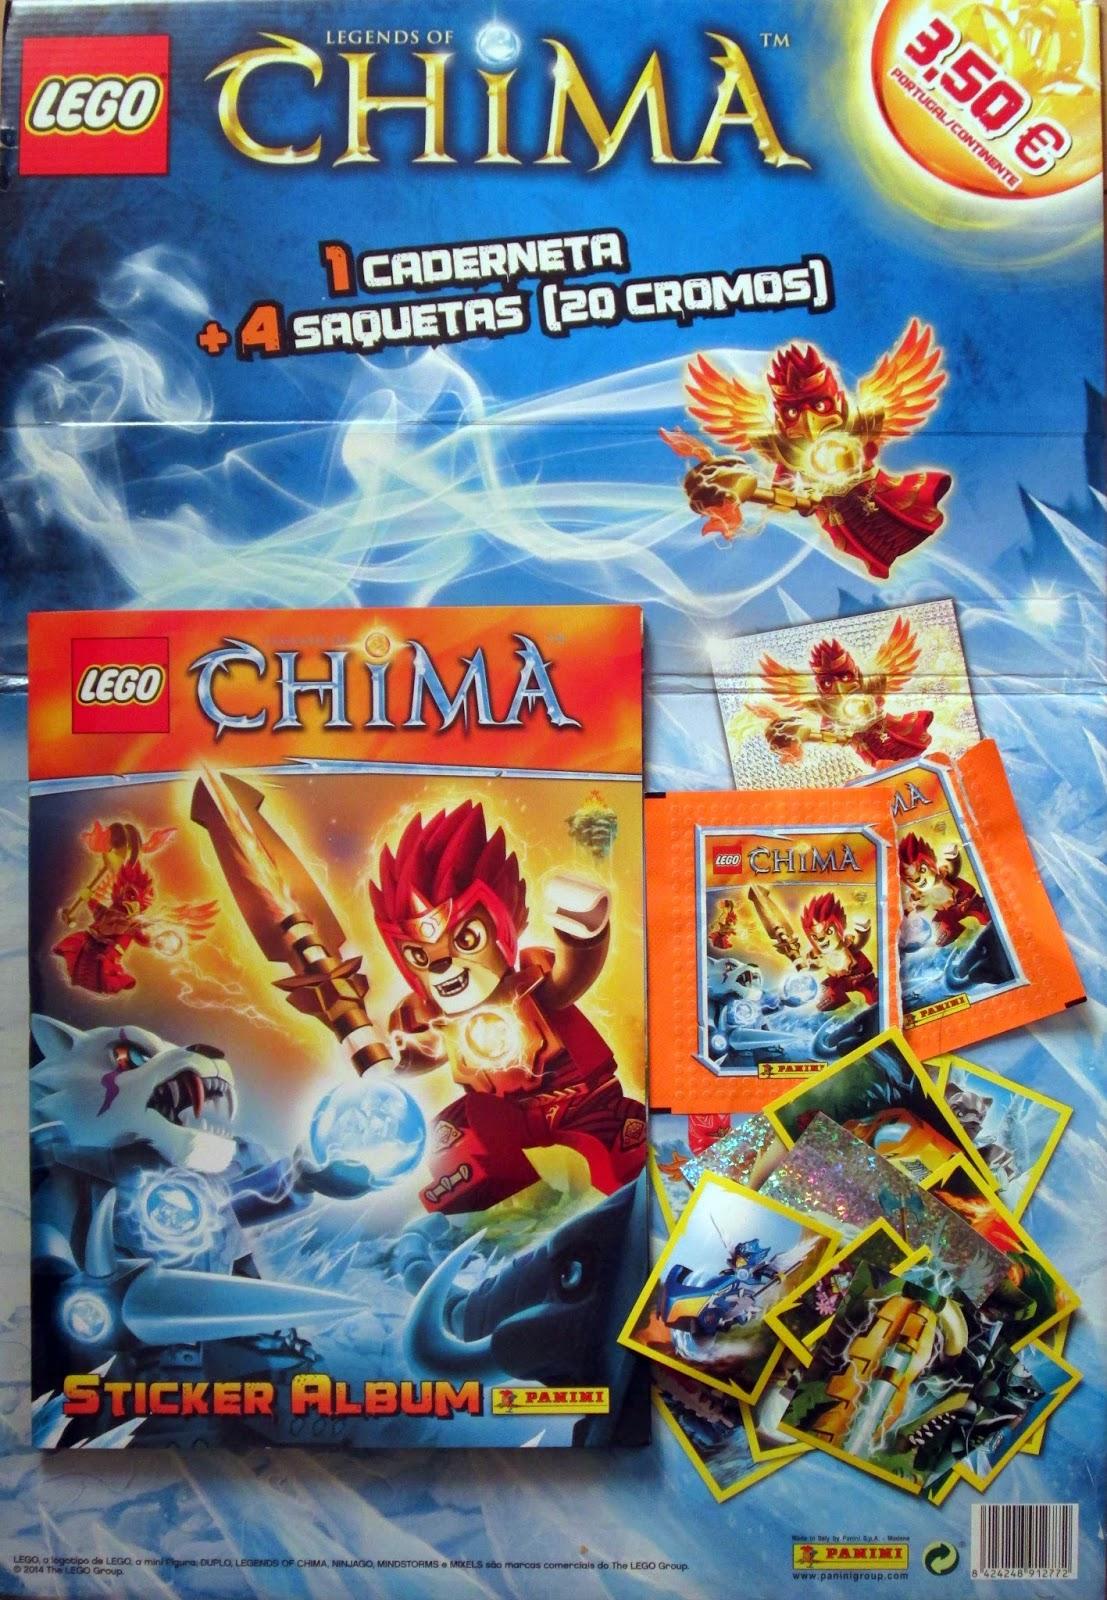 LEGO CHIMA - caderneta de cromos da PANINI